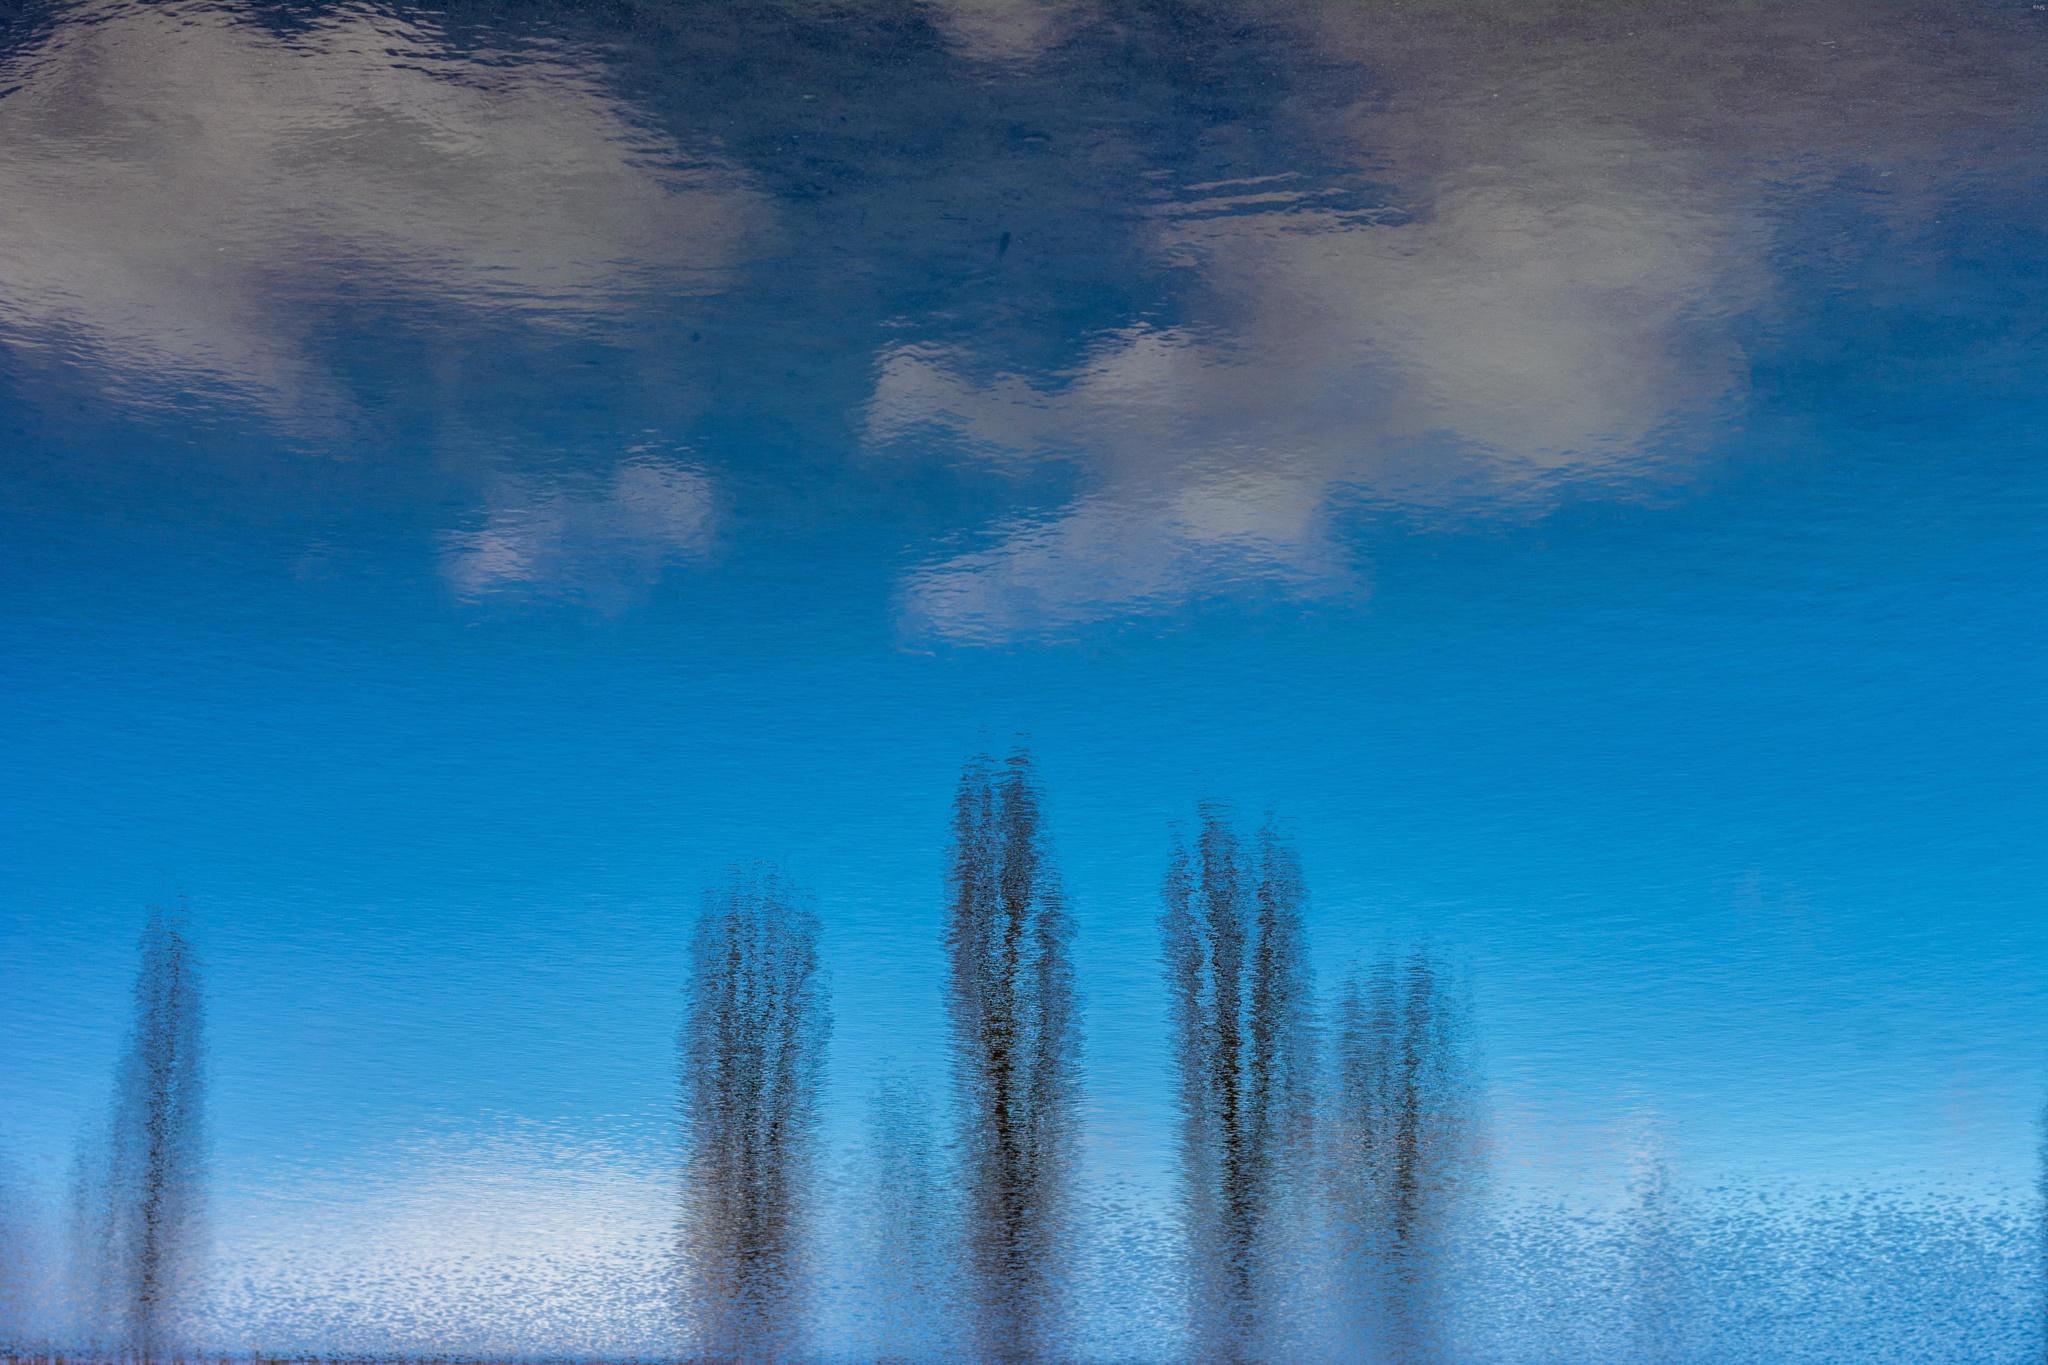 Reflection by Sivakumar